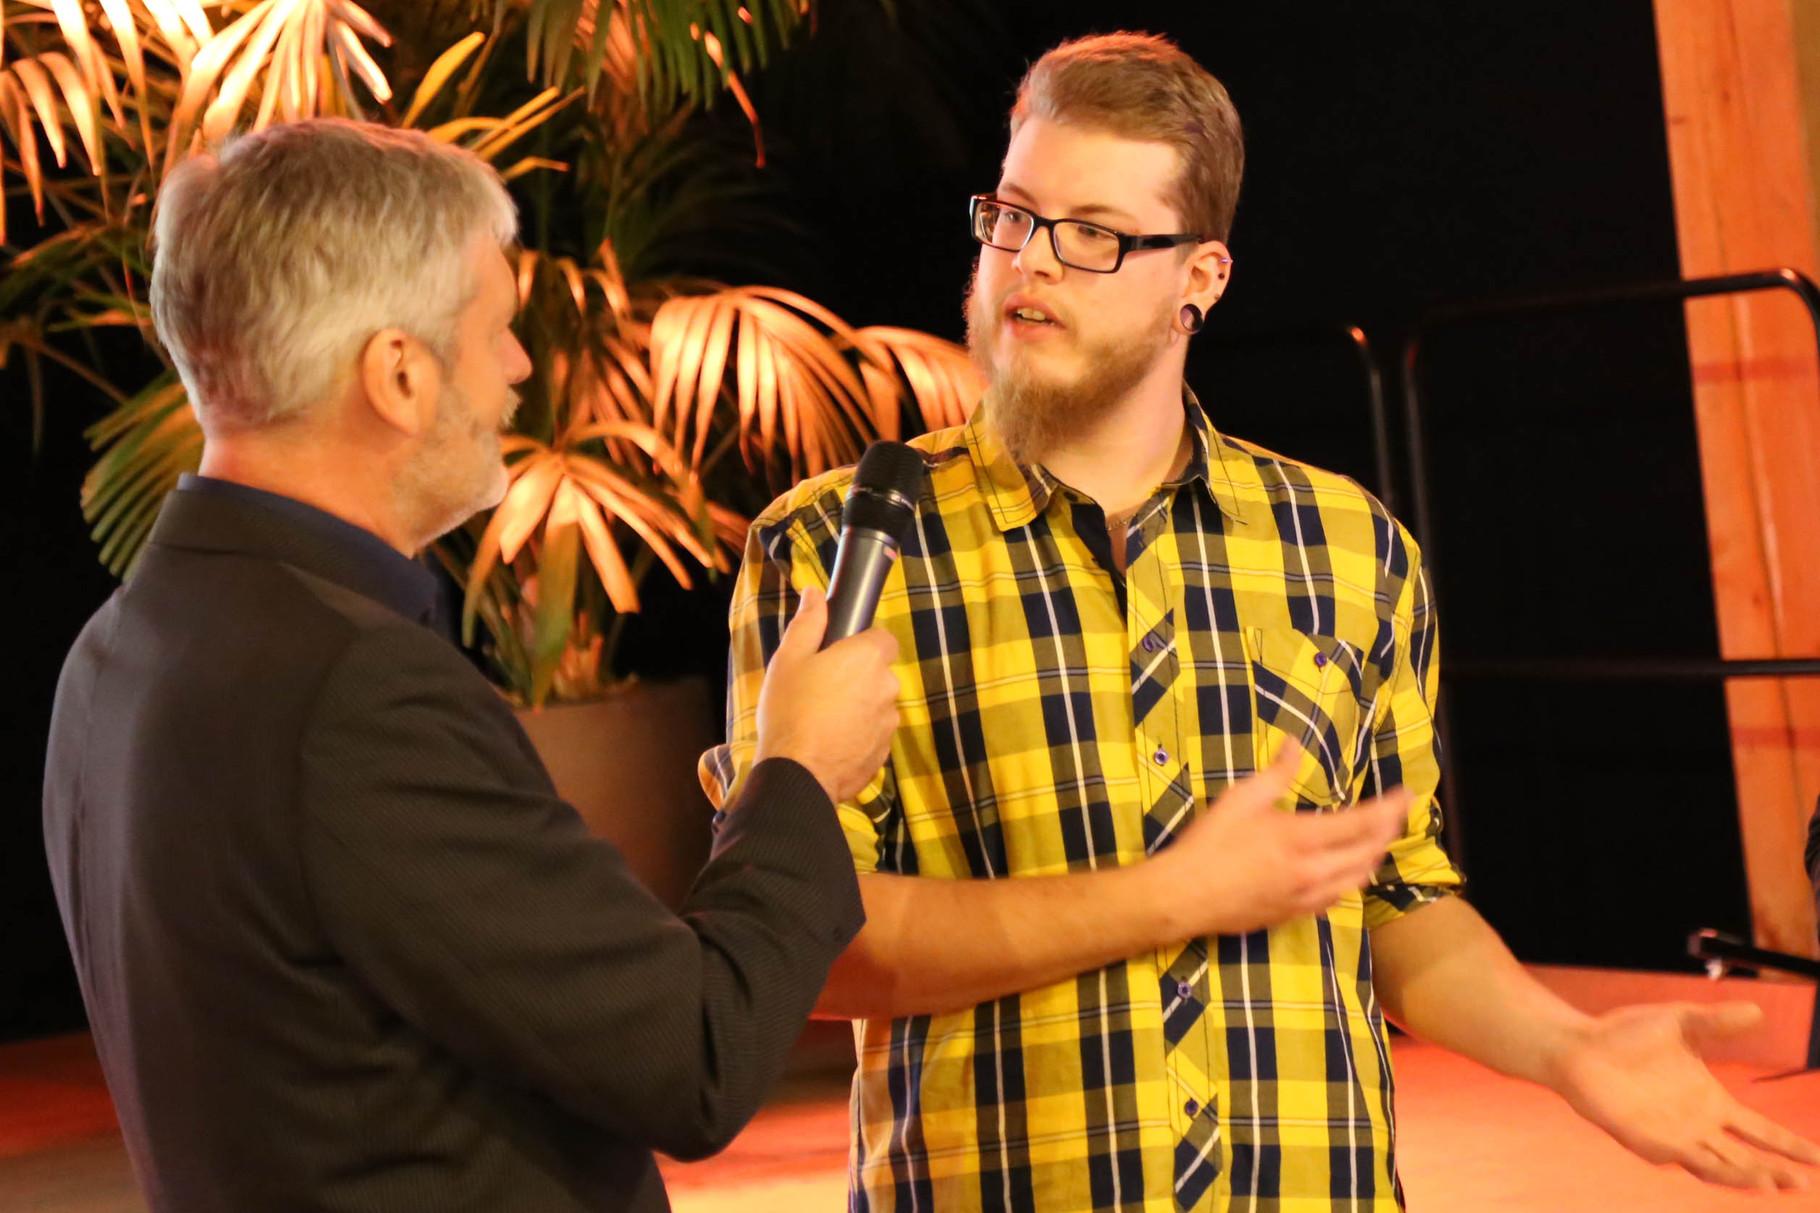 Preisverleihung anl. des KIWi-Logo-Wettbewerbe von links: Frank Christgen (1. Vorsitzender KIWi), Christian FESO Mast, Foto: Thomas Weber